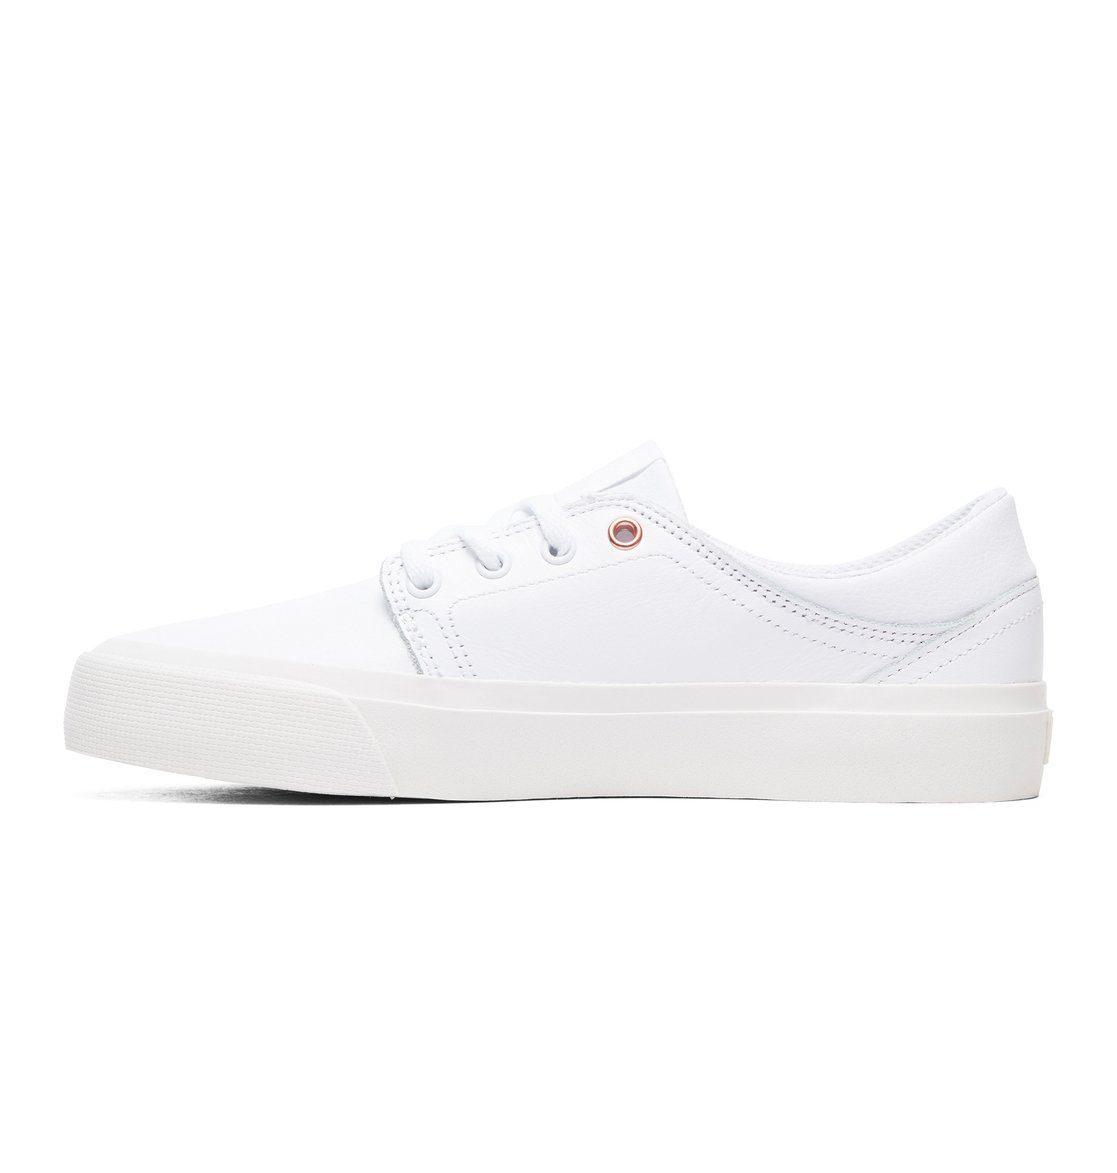 DC Shoes Schuhe Trase LE online kaufen  White#ft5_slash#white